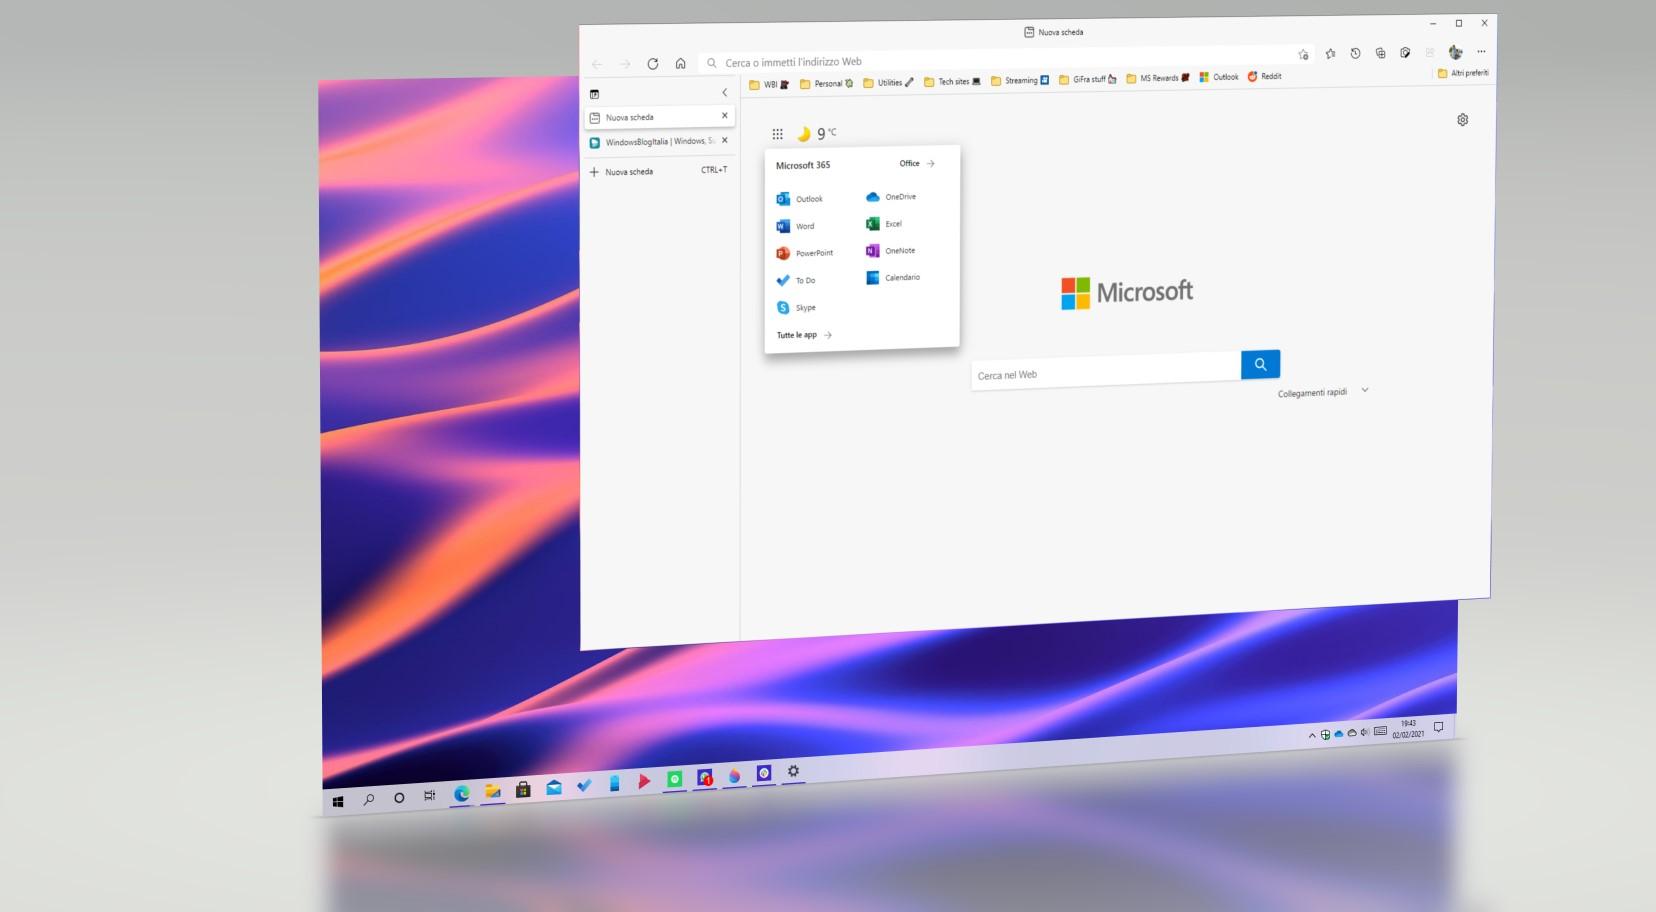 Microsoft Edge - Windows 10